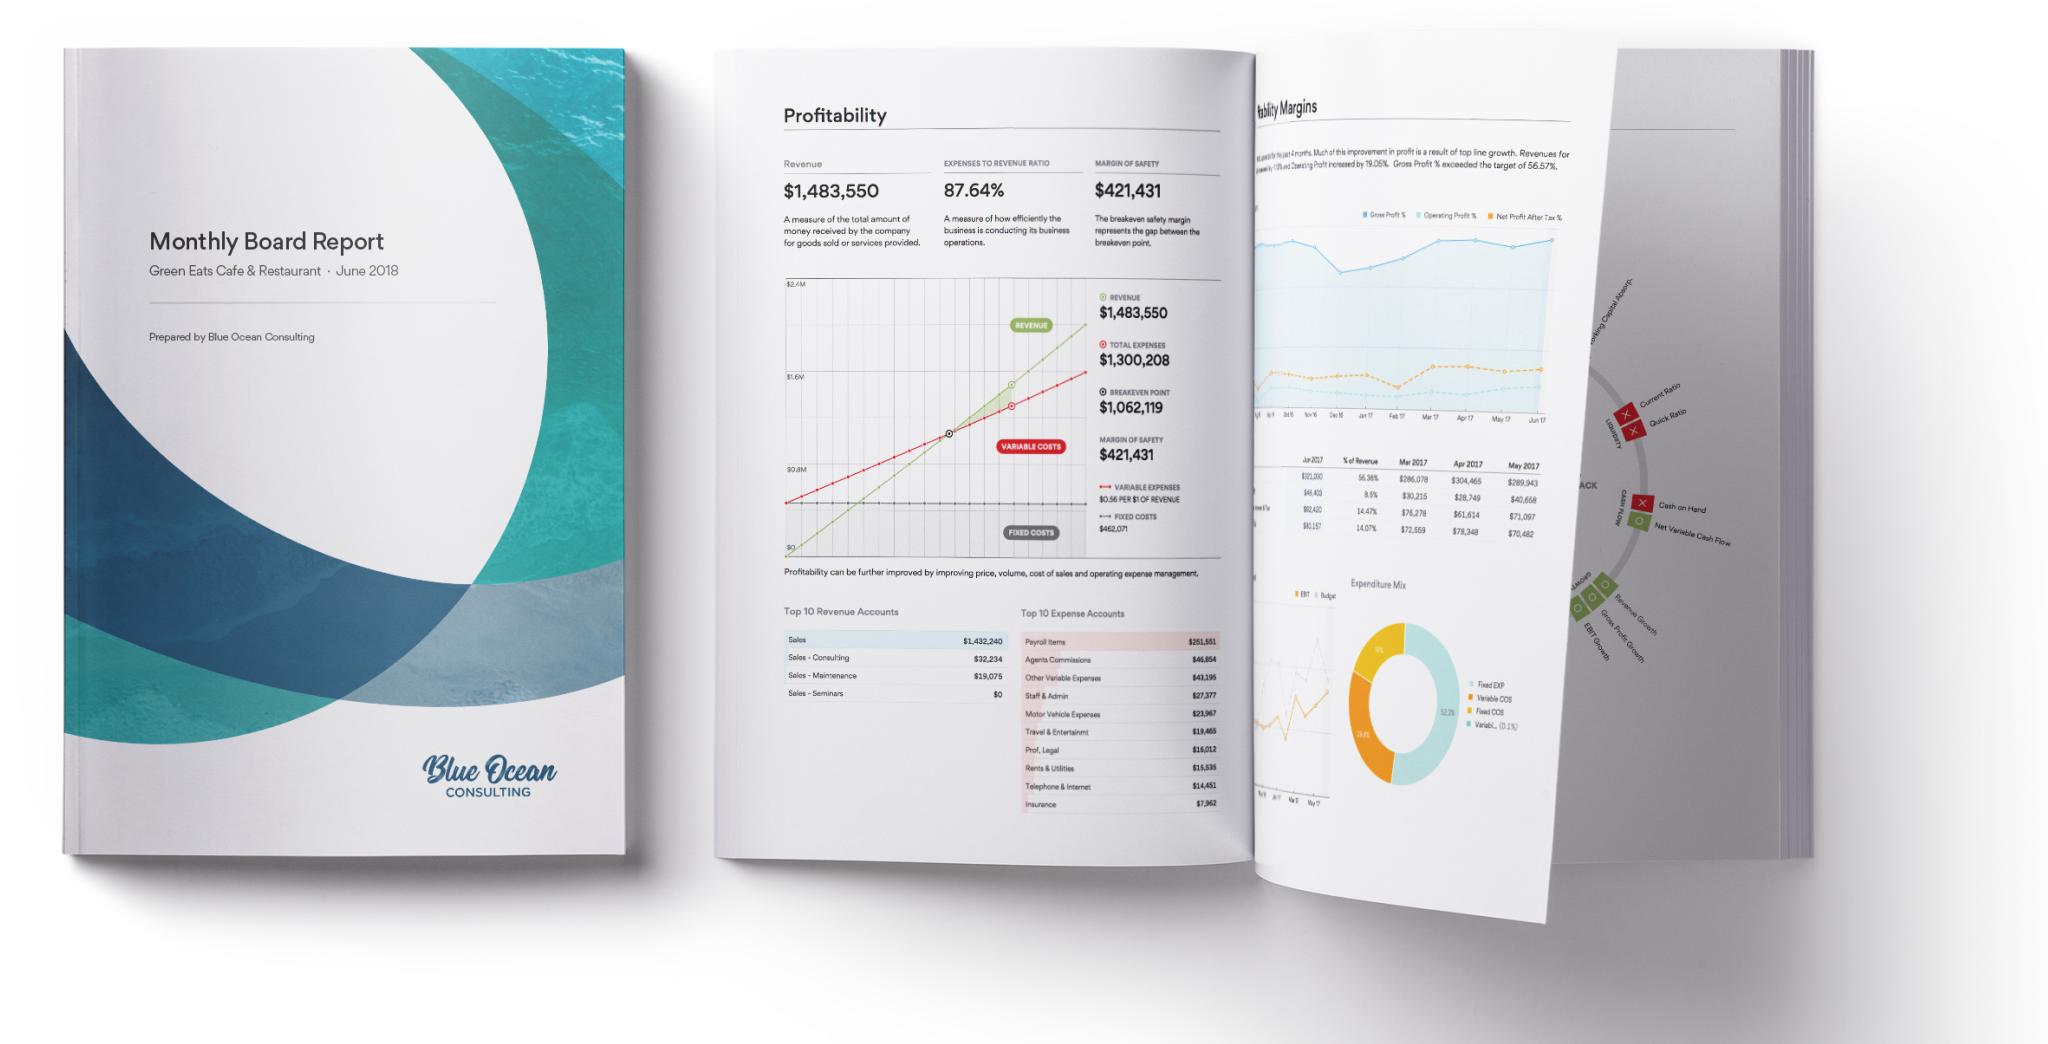 Business-unusual-series-11-Enhance-communication-to-stakeholders_PDF_mockup